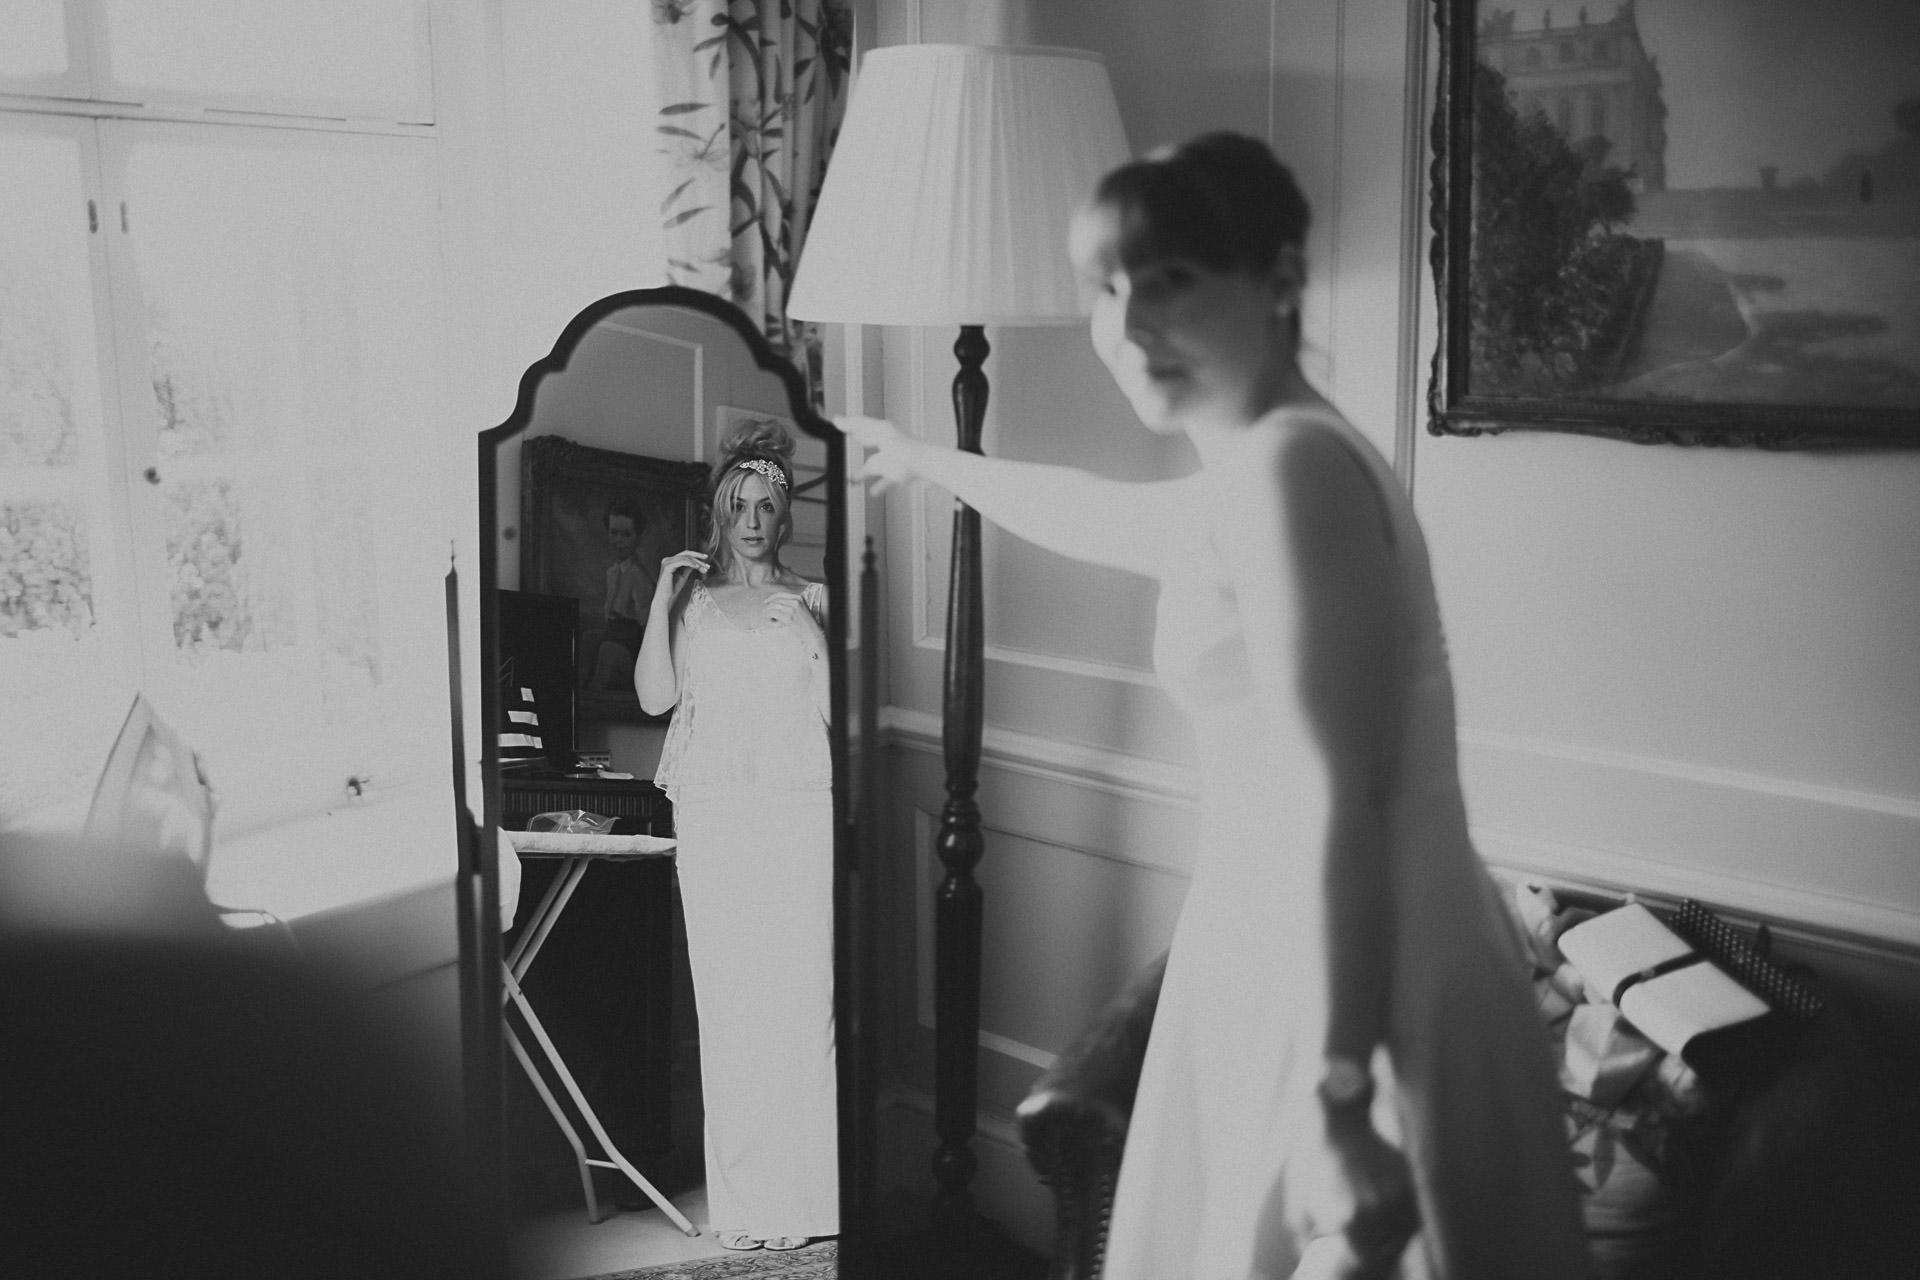 Wedding photographer Cornwall awards